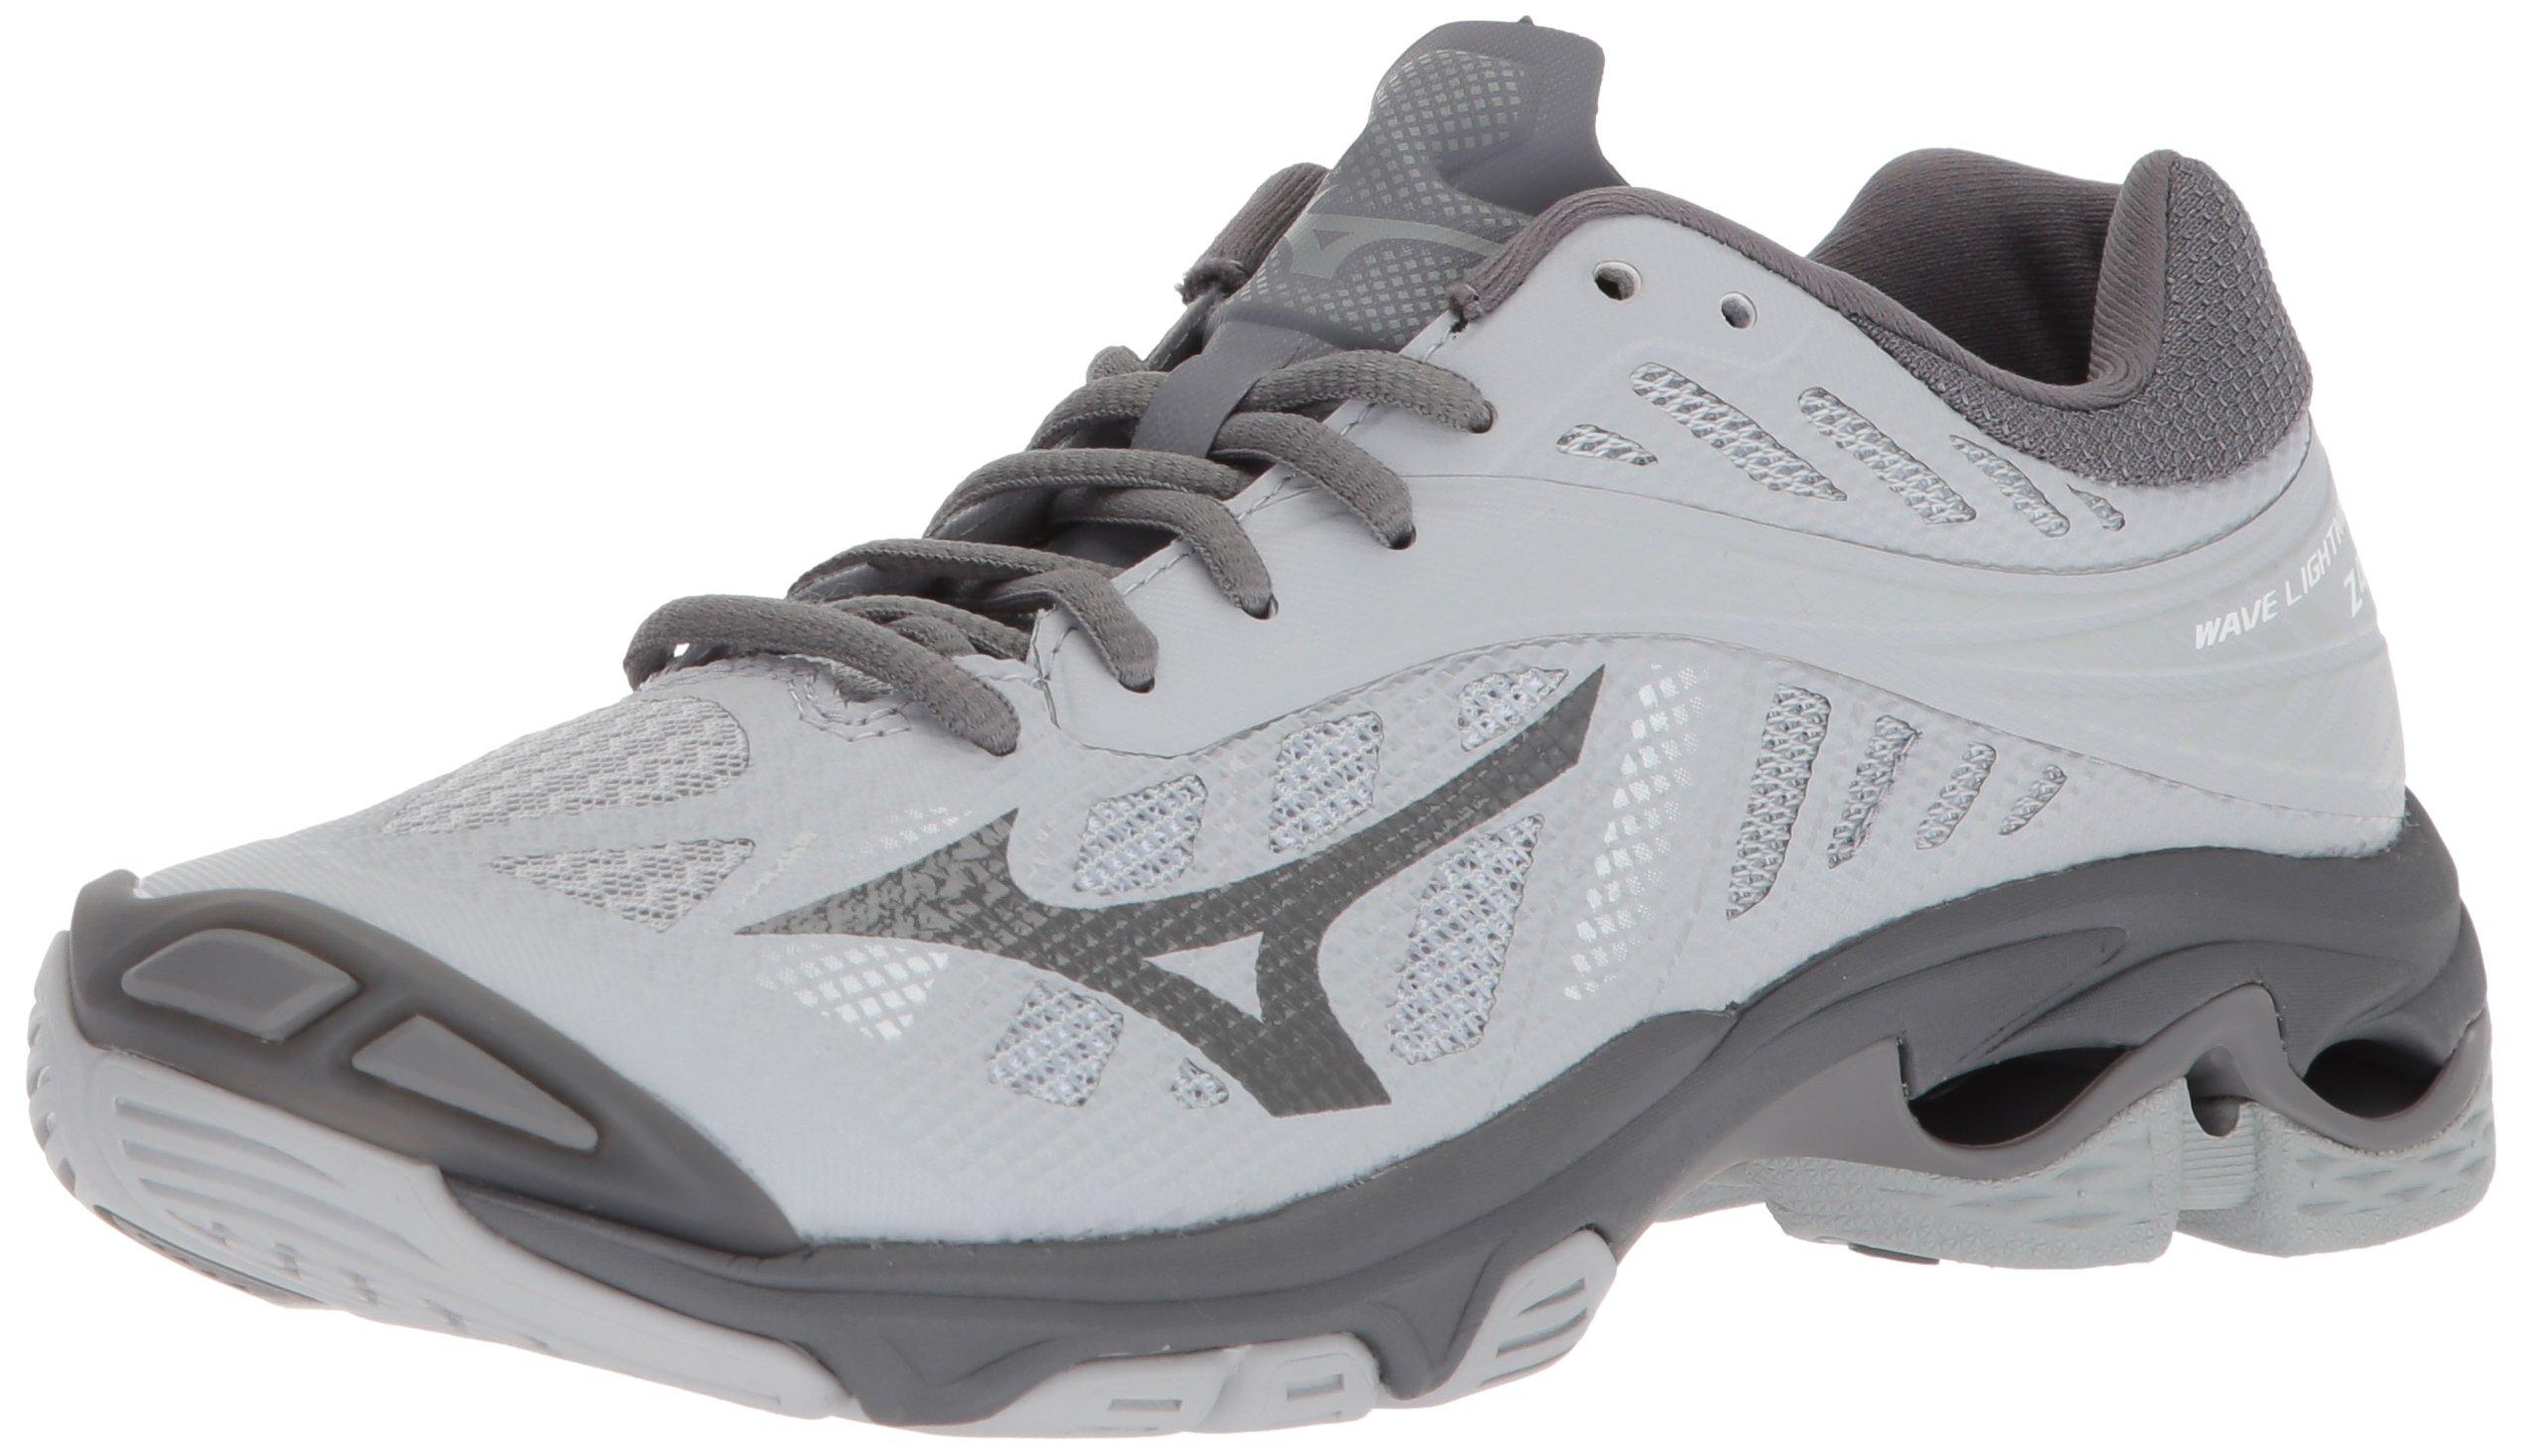 Mizuno Wave Lightning Z4 Volleyball Shoes, Grey Women's 6 B US